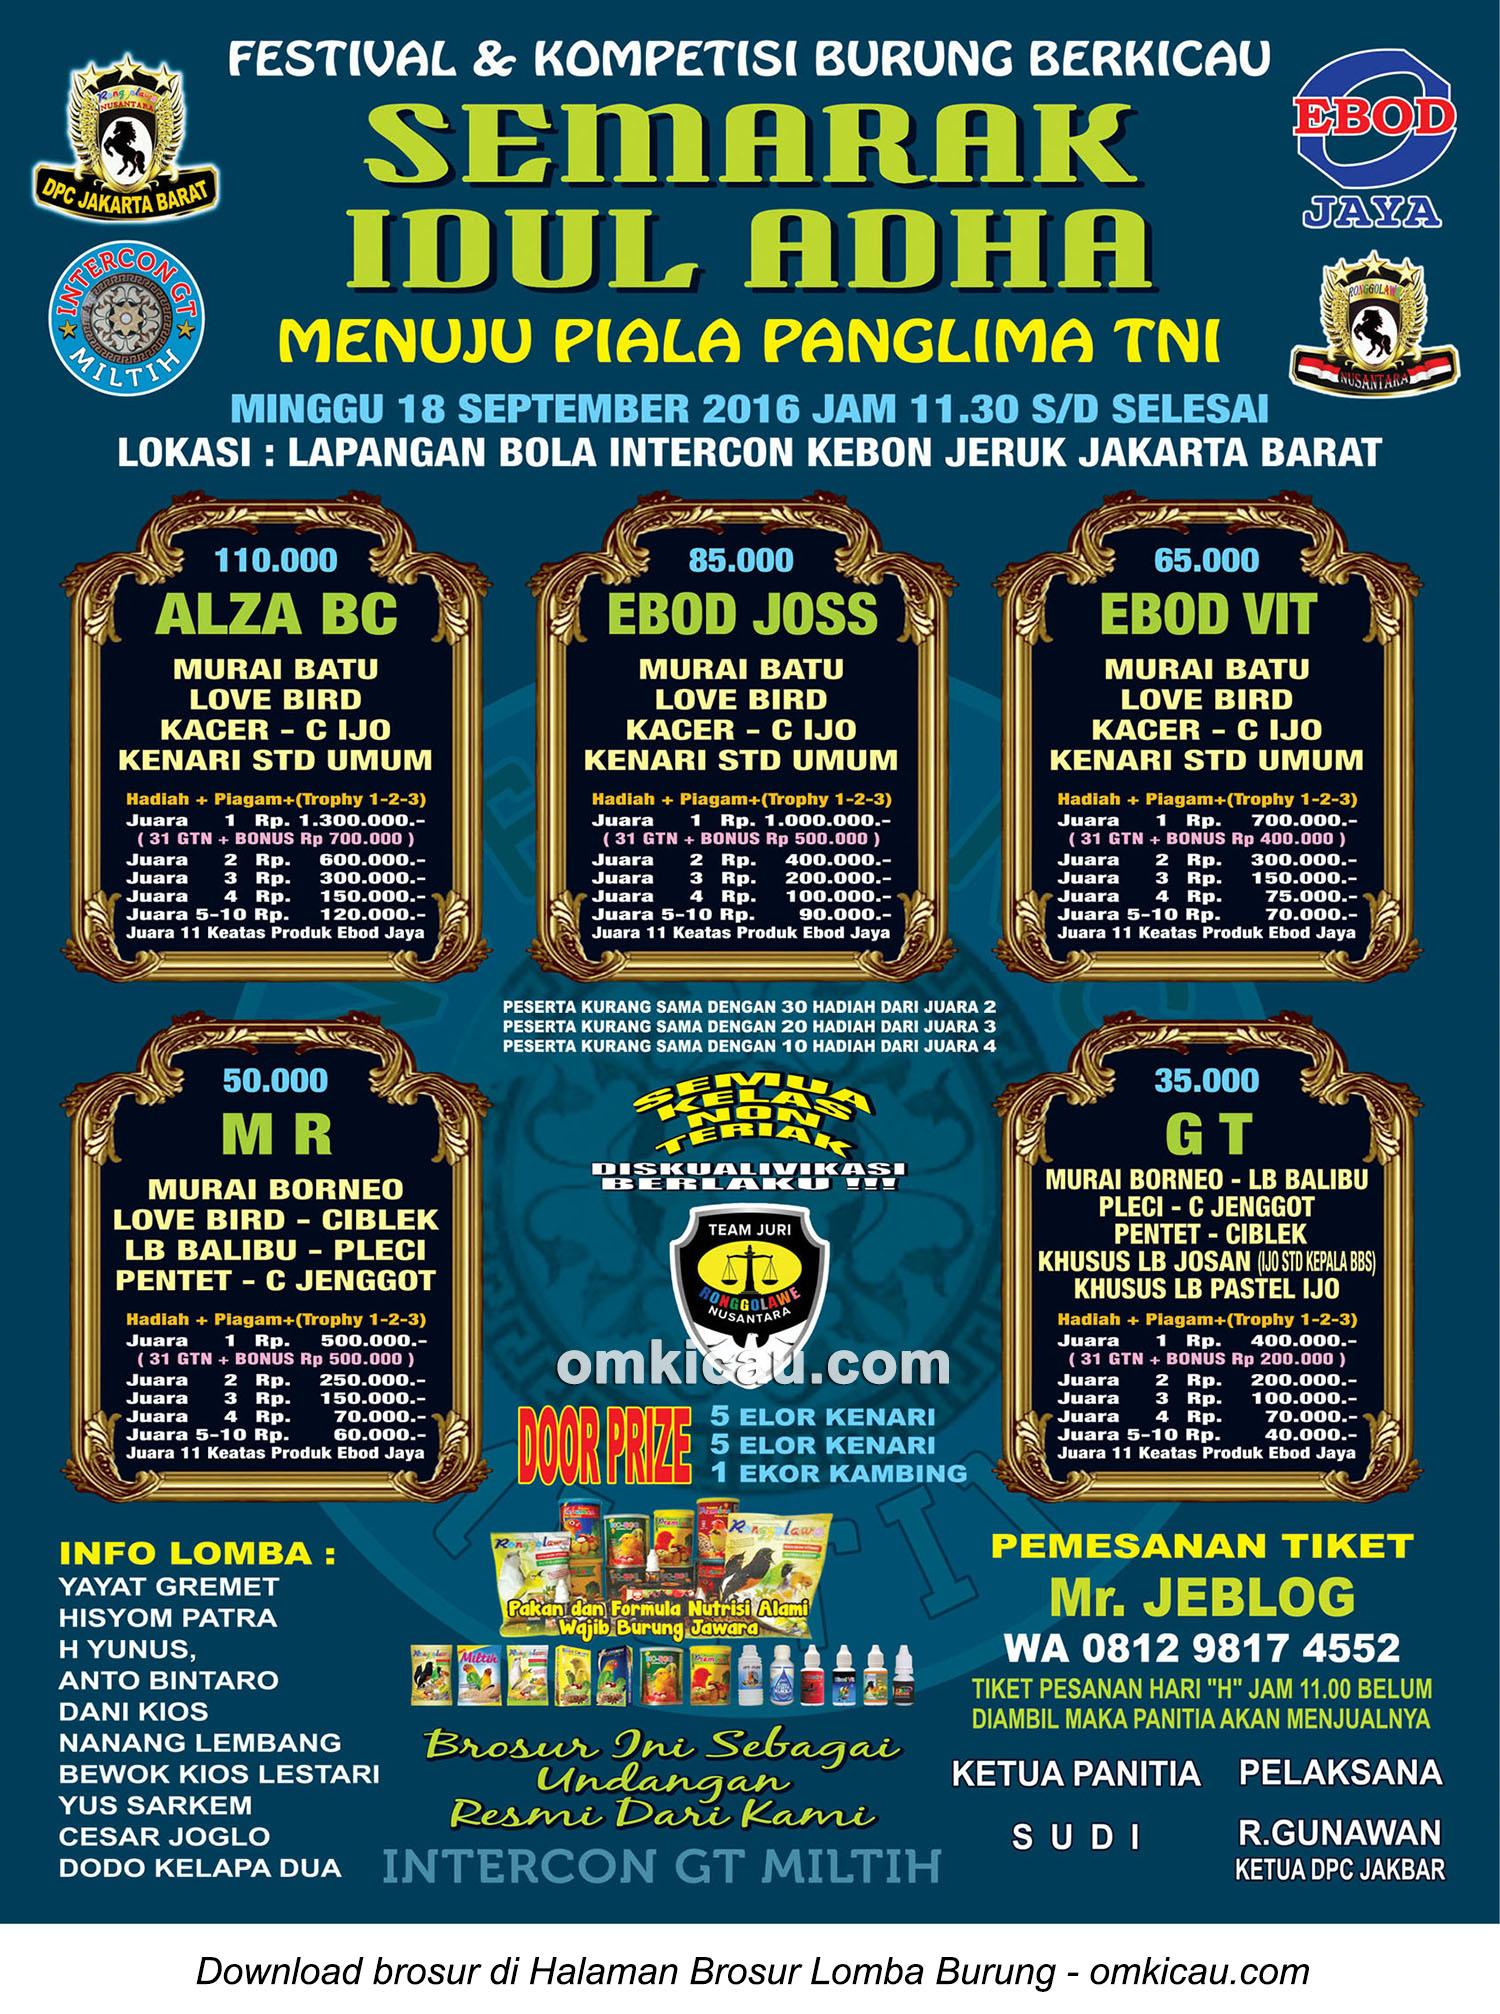 Brosur Lomba Burung Berkicau Semarak Idul Adha Intercon, GT, Jakarta Barat, 18 September 2016